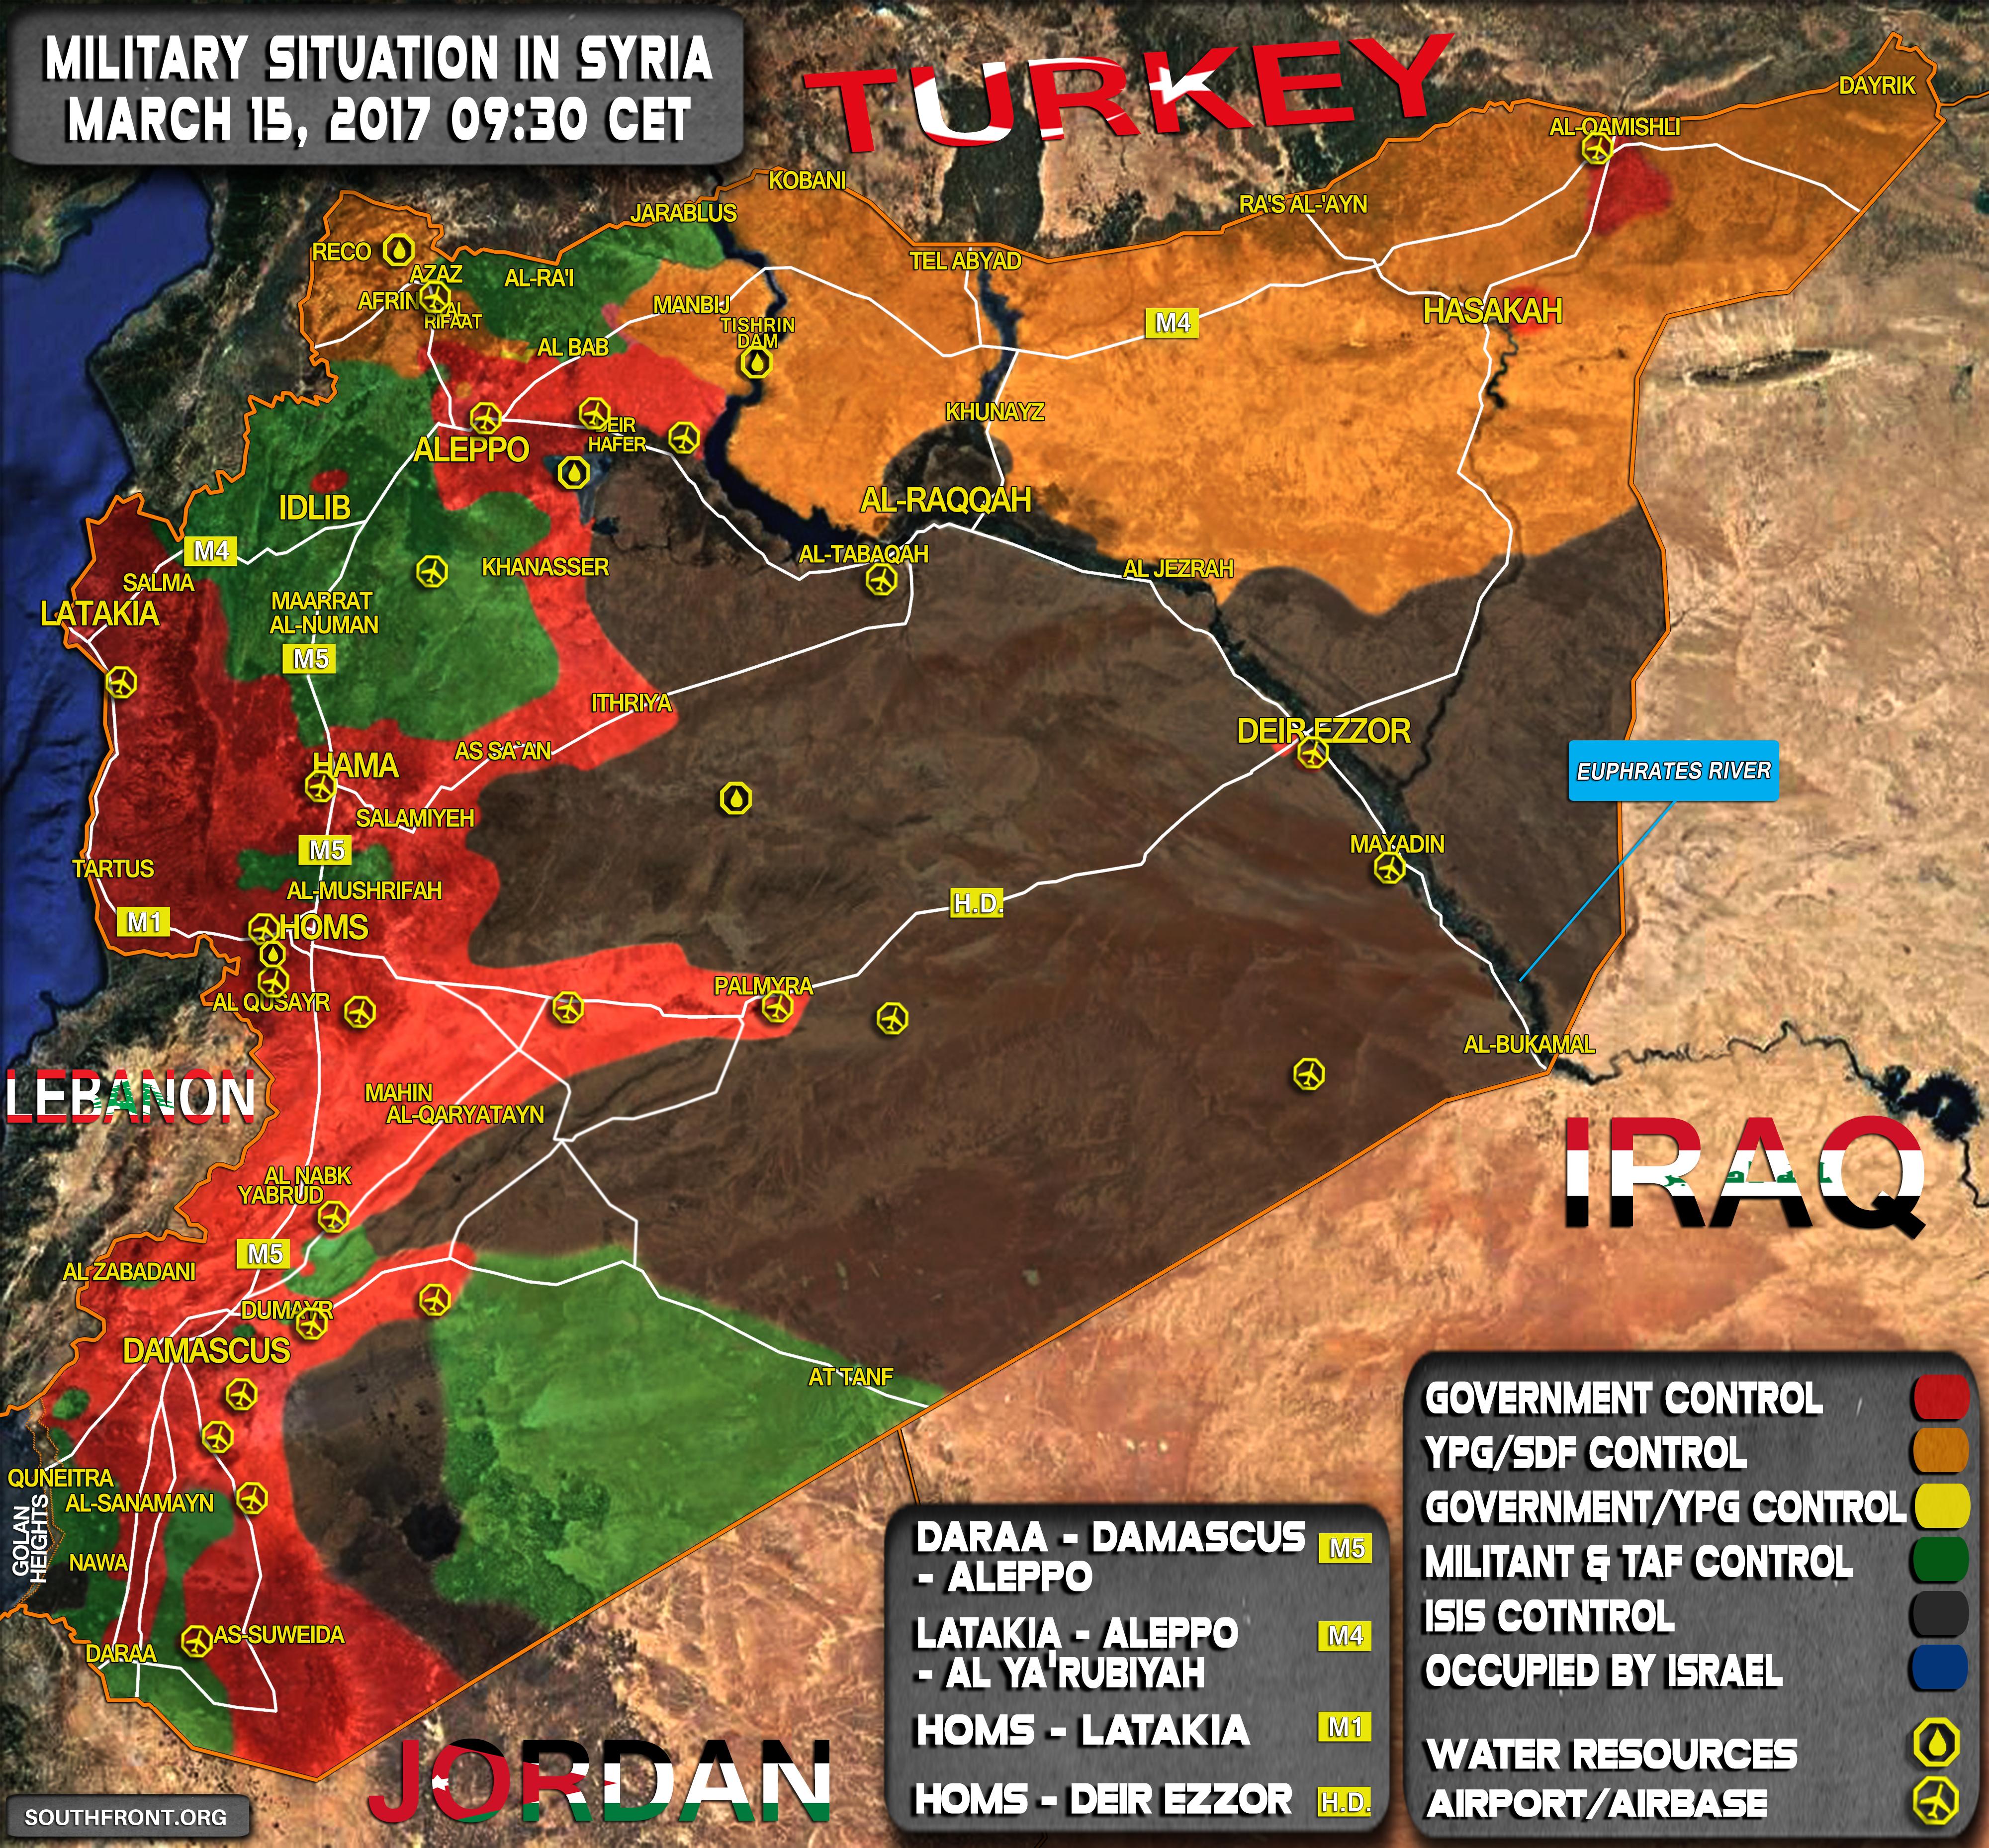 15m_09_30_syria_war_map